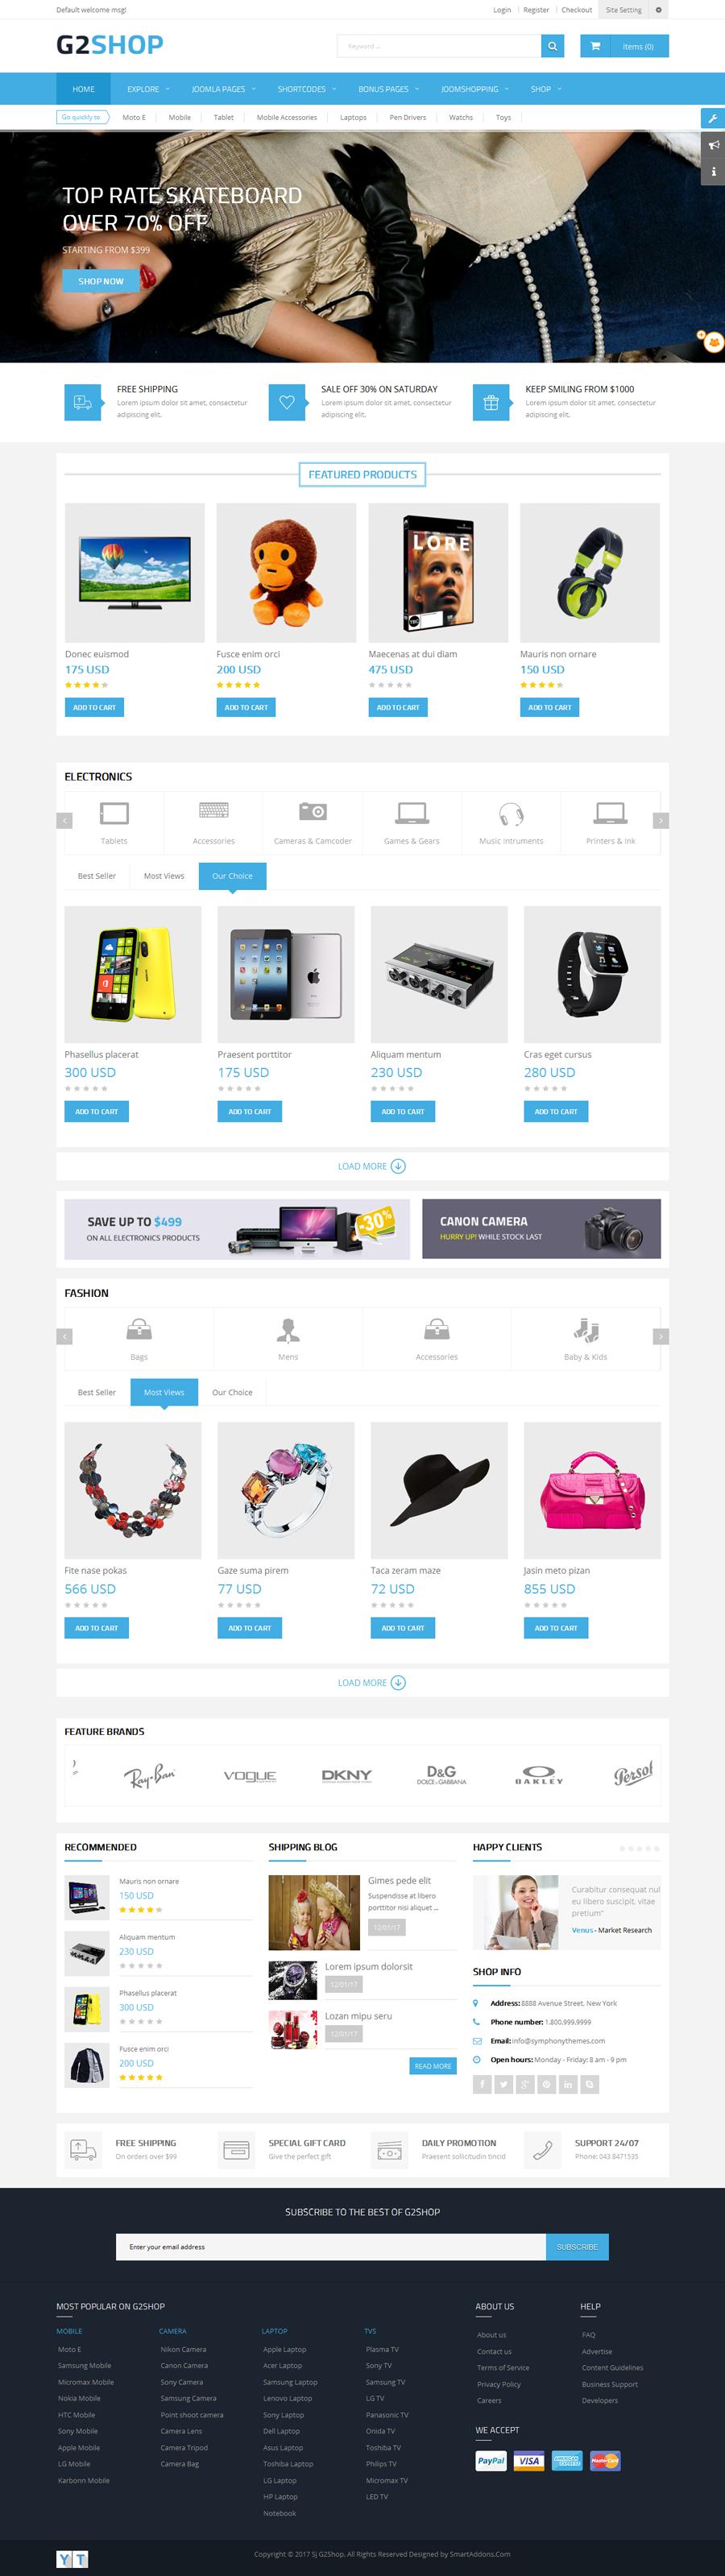 G2Shop - Responsive Ecommerce Joomla Template by SmartAddons ...